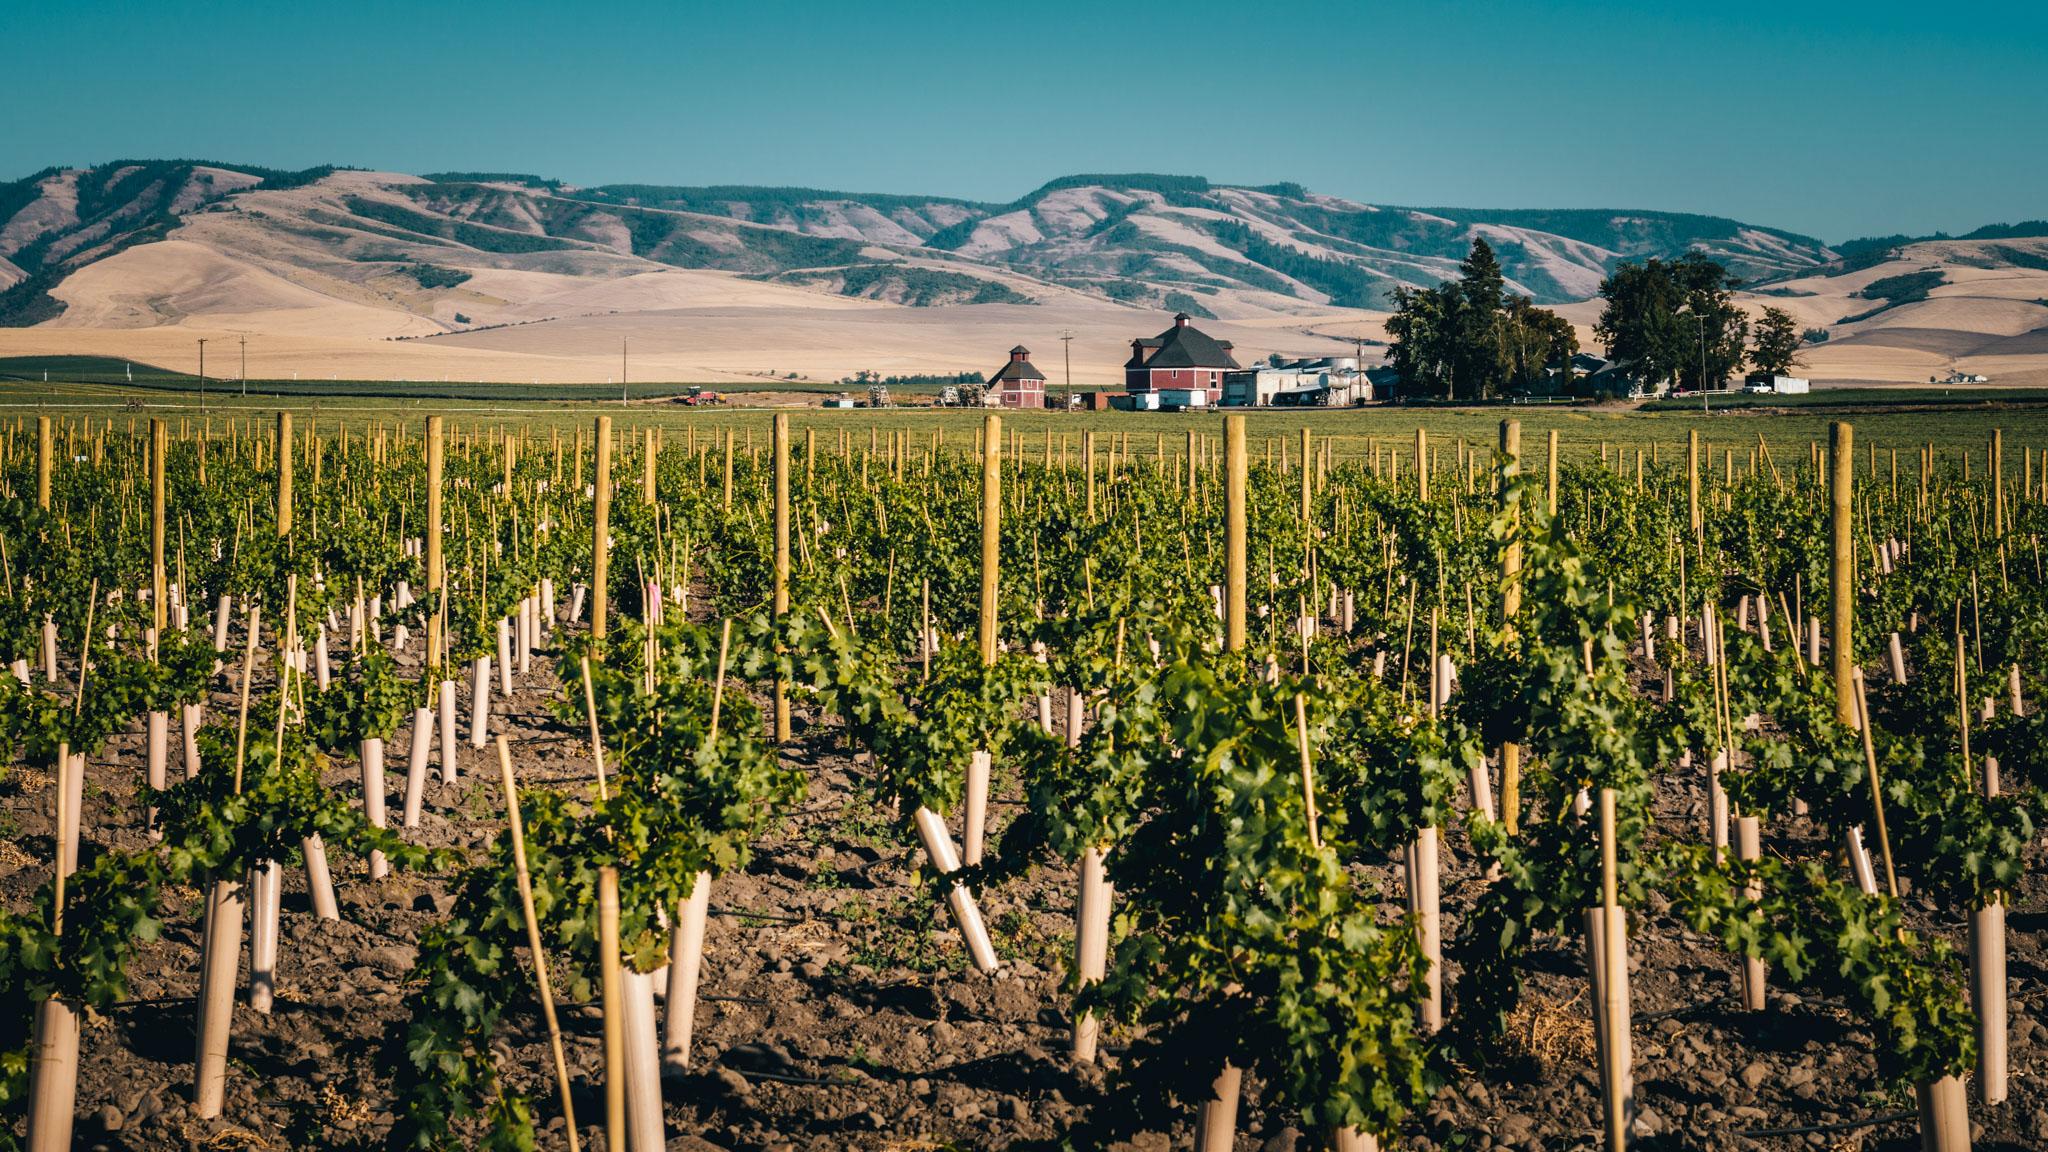 US : Washington : A new vineyard planted in Walla Walla